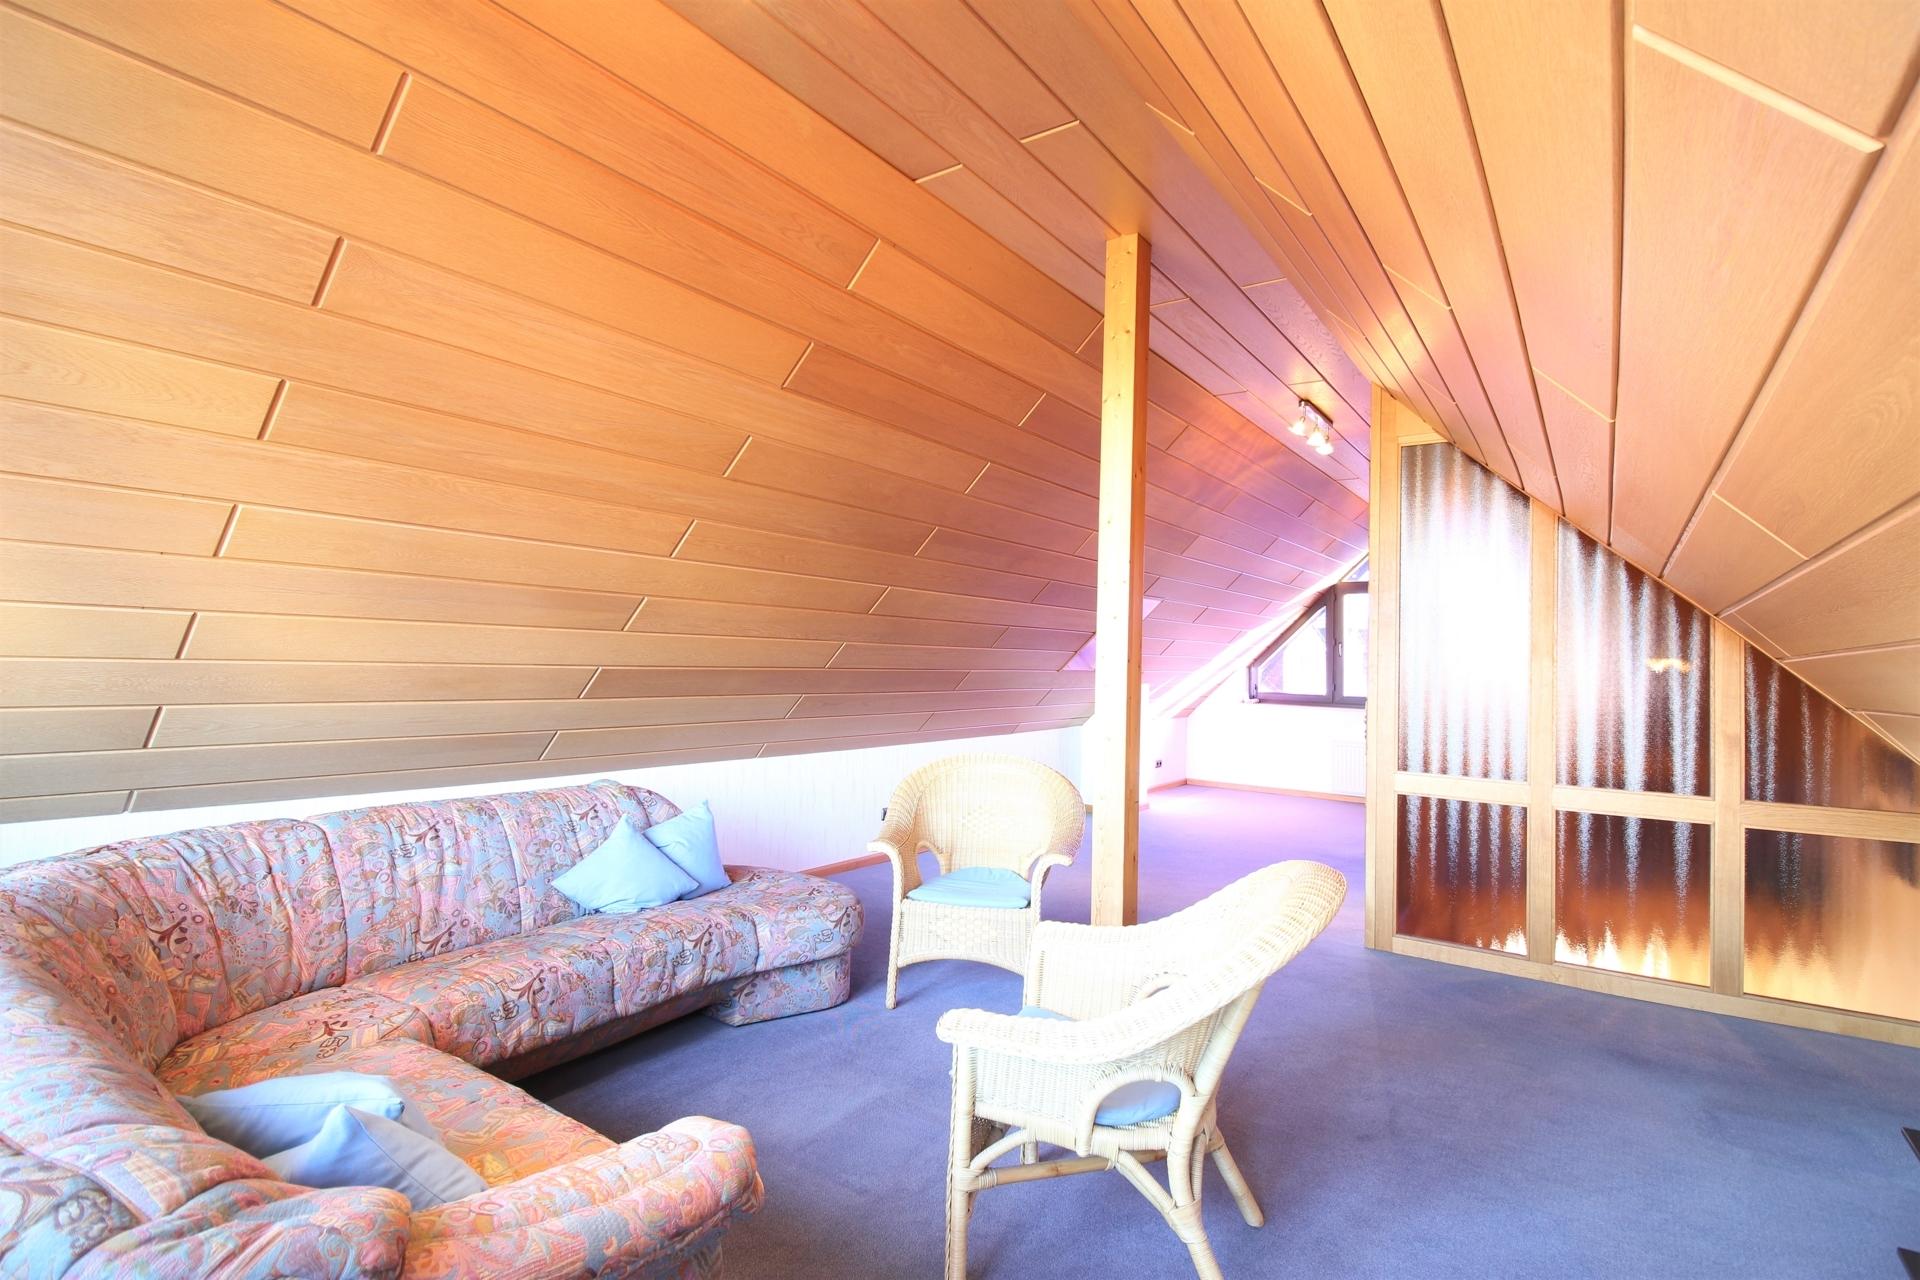 Studio 4,91 m x 10,18 m